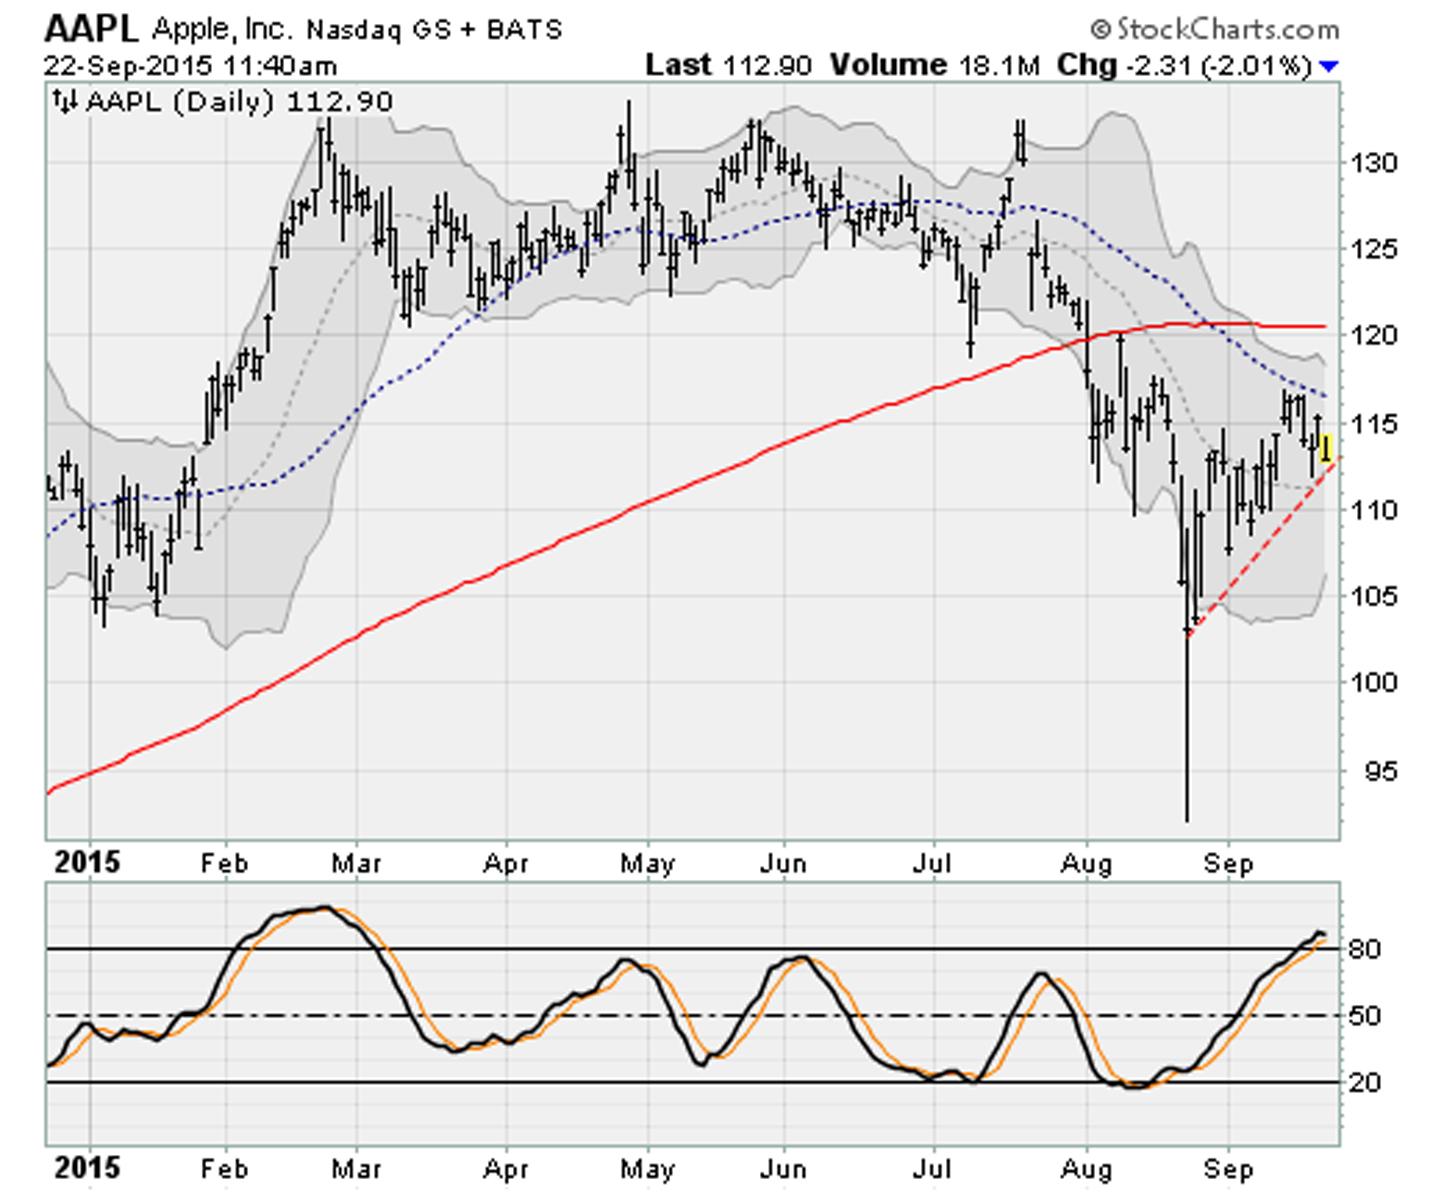 Dow Jones Stocks Breaking Down: Apple (AAPL)